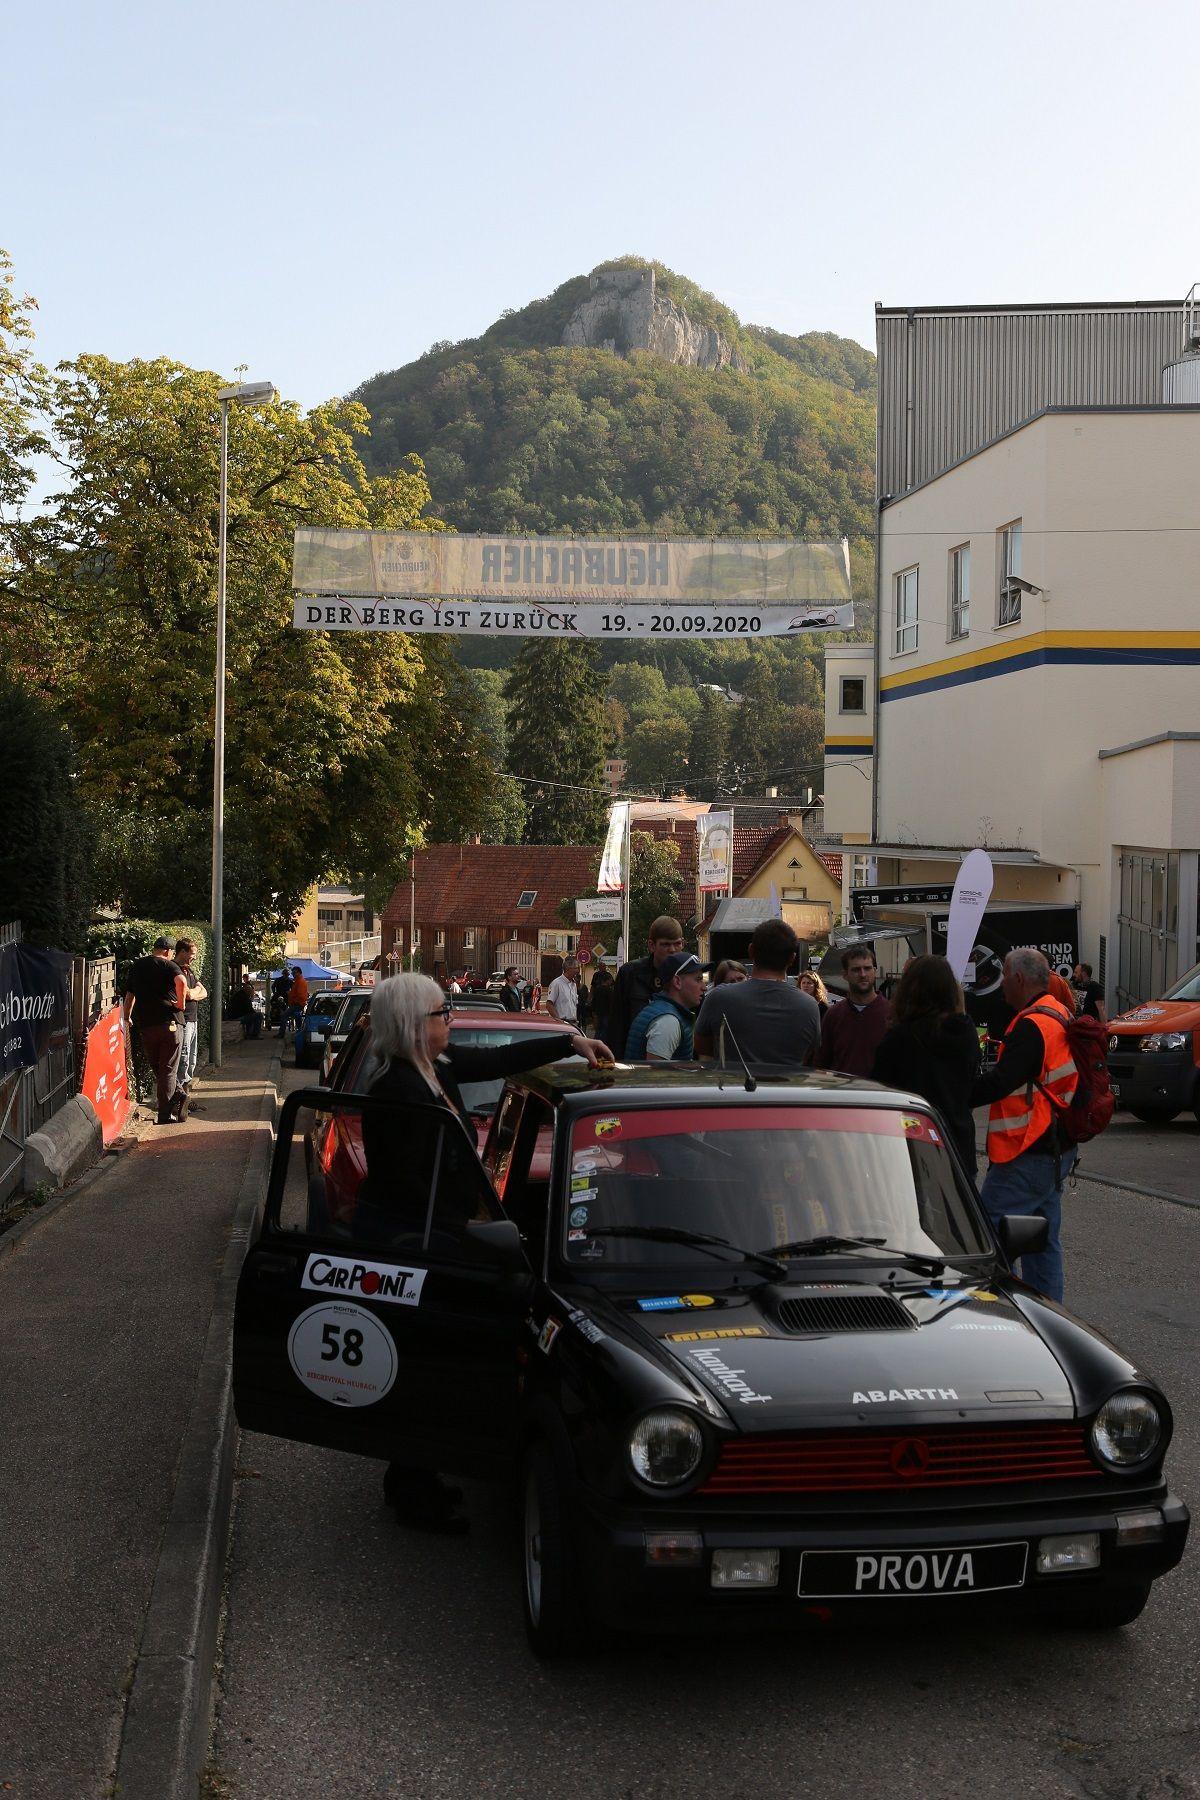 130 Teilnehmer beim Bergrevival in Heubach